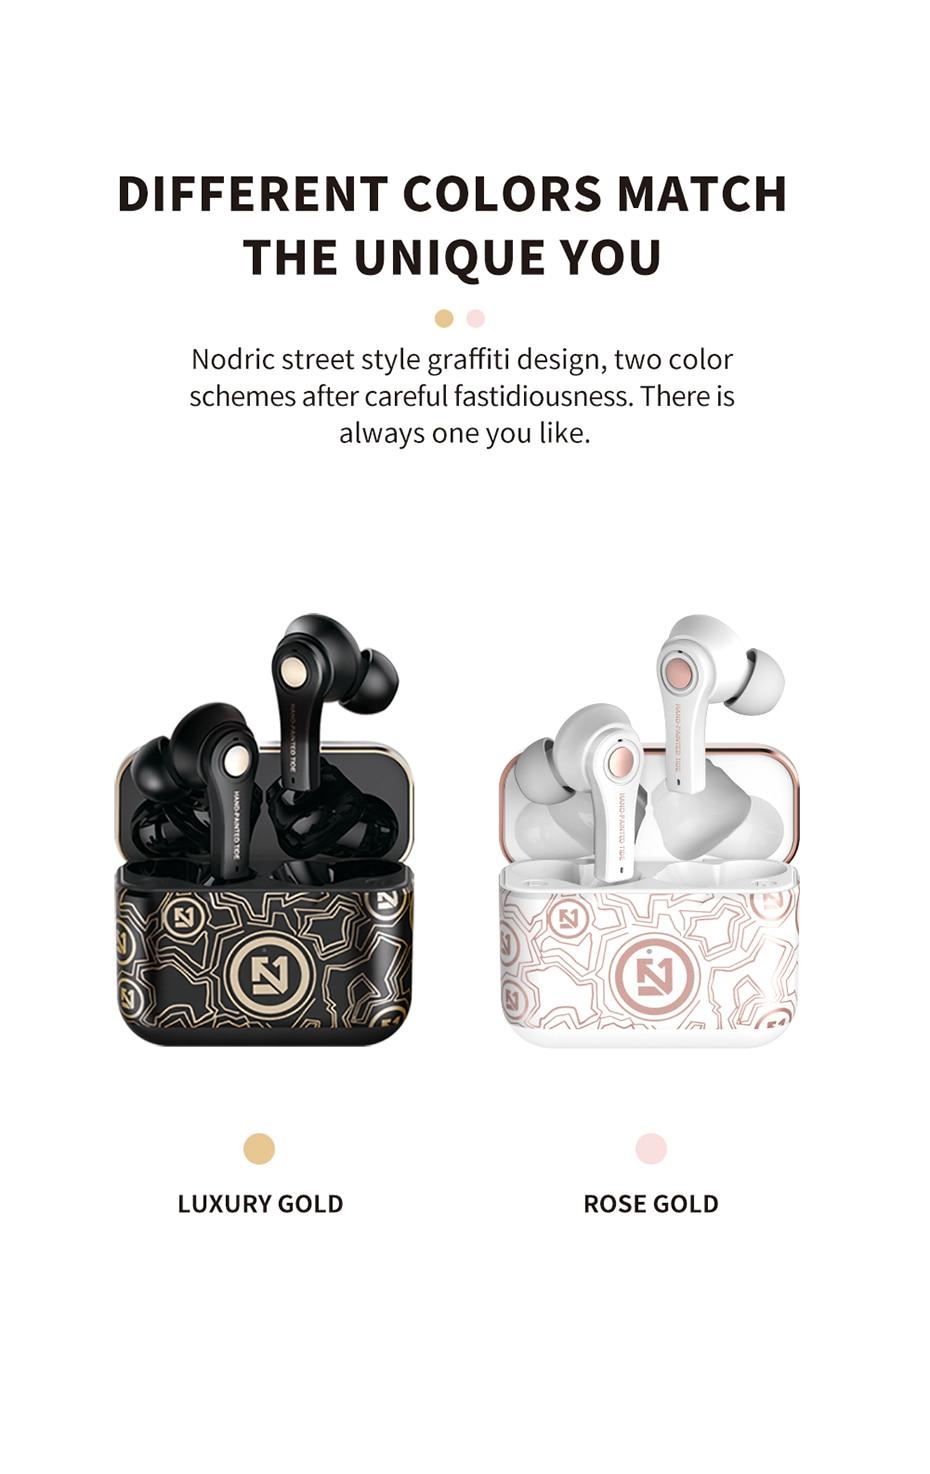 BONOLA TWS Wireless Bluetooth Headset 5.0 Sport Waterproof Earbud Earphone with Microphone for iPhone 1212Mini Xiaomi Samsung (10)